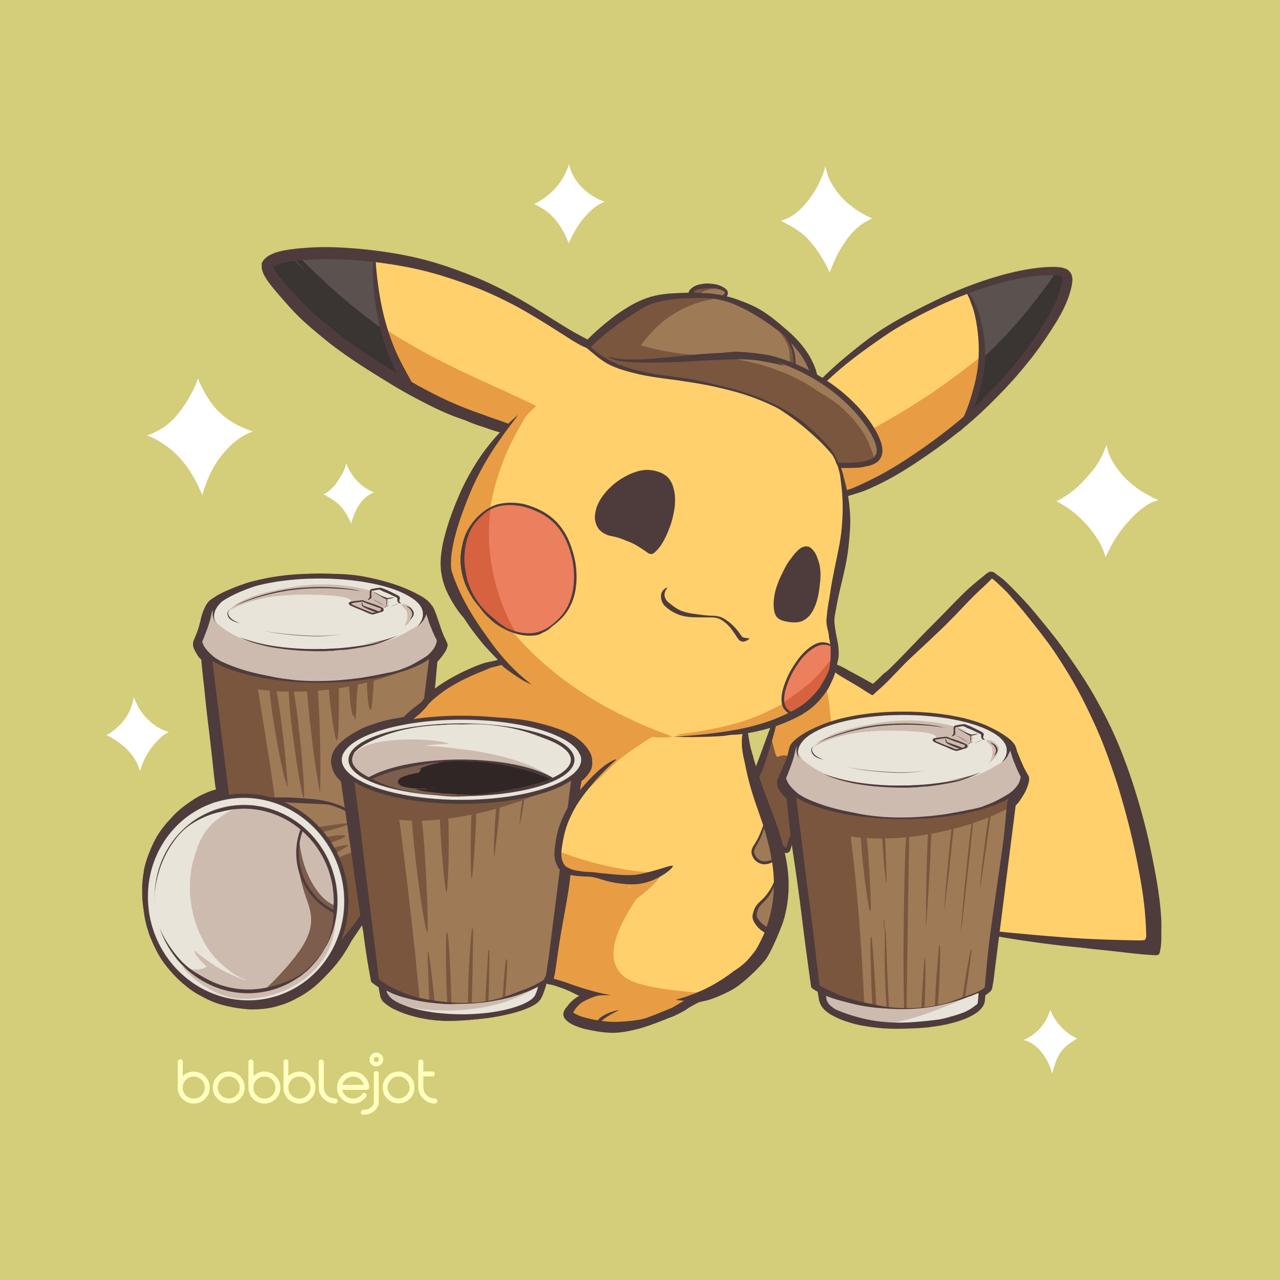 Illustrator Of Cute Things